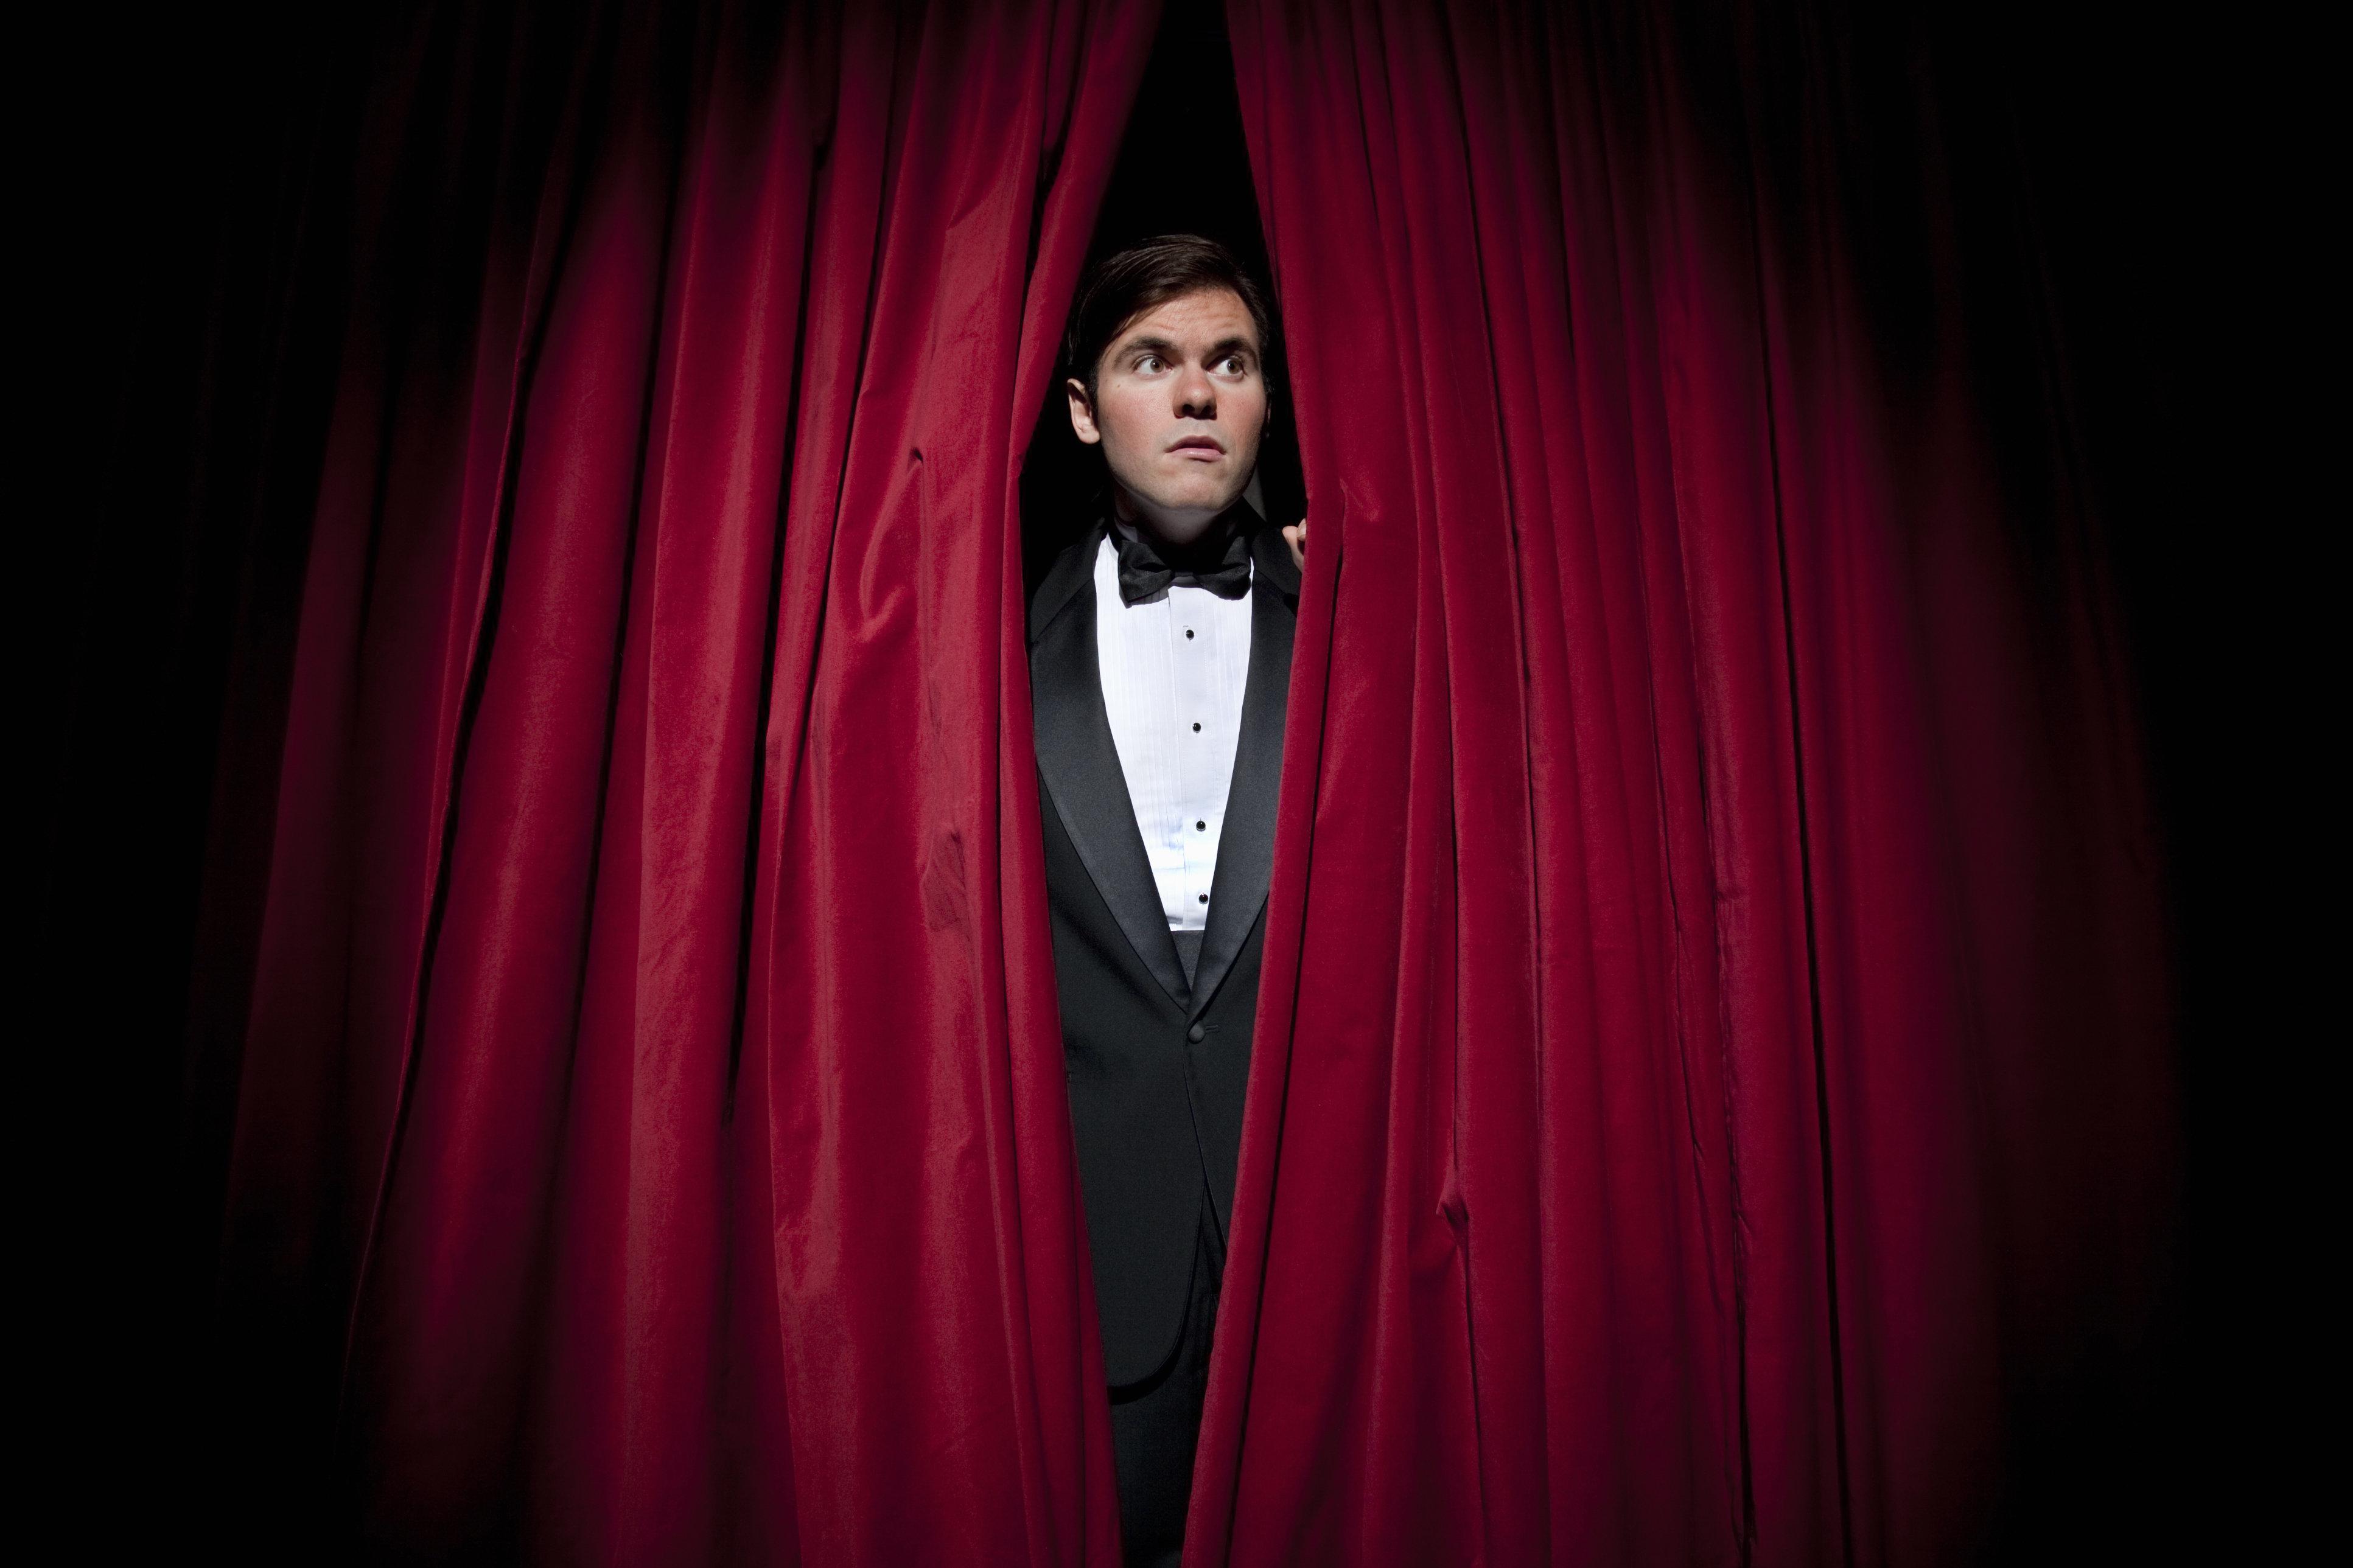 Man in tuxedo peeking through curtain